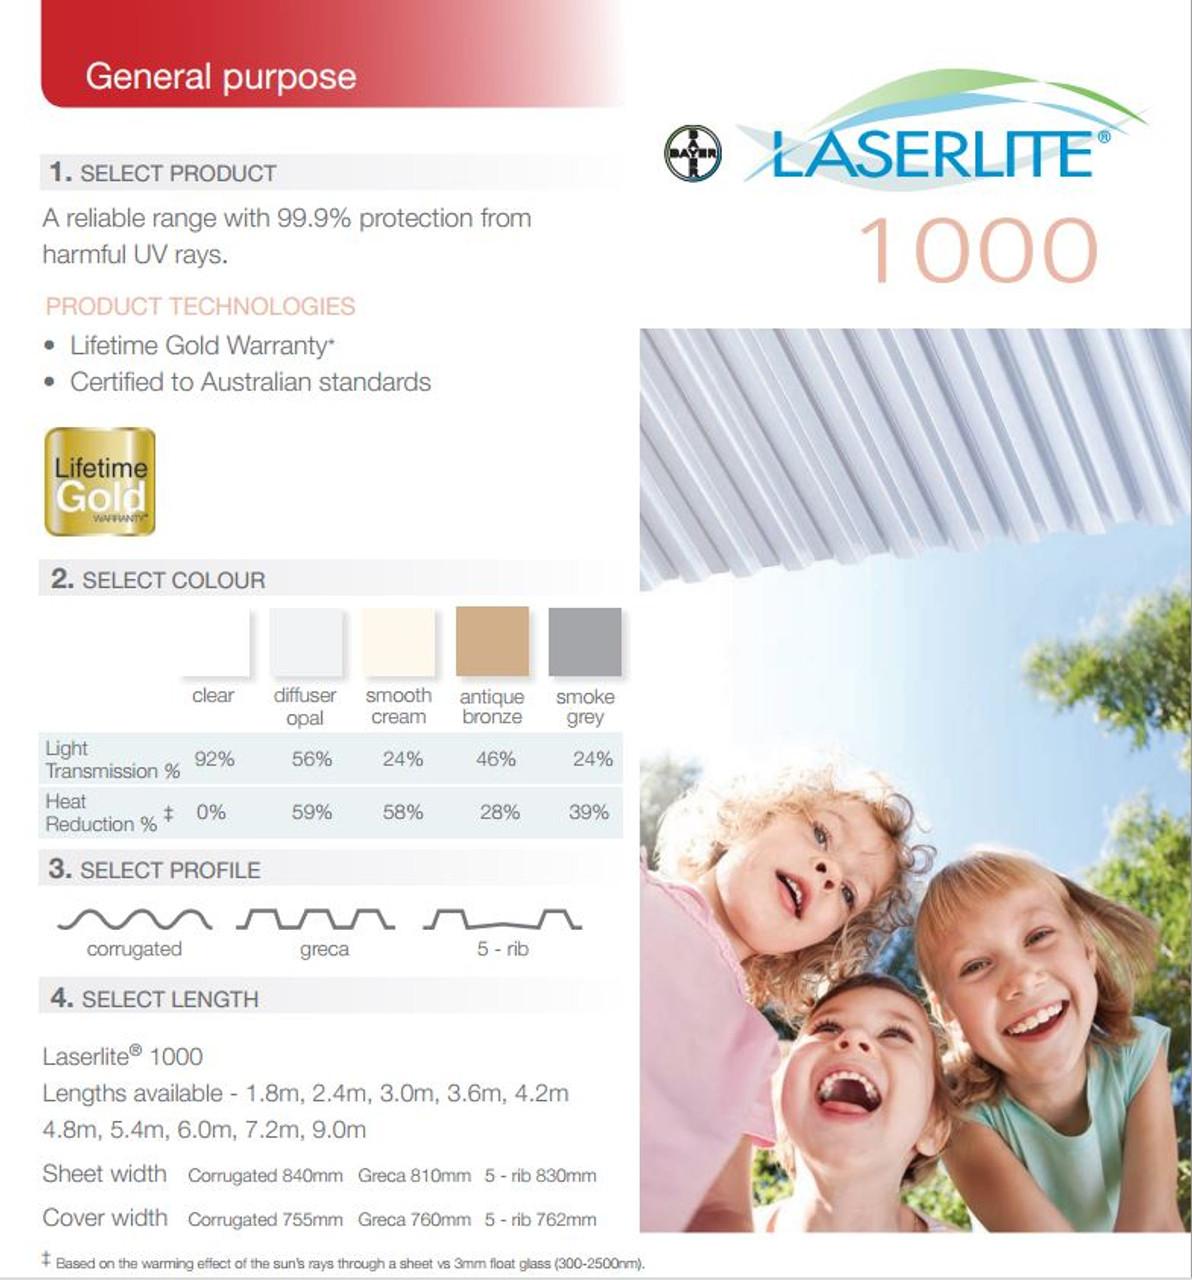 Laserlite 1000 Greca Polycarb Roofing Standard per L/M